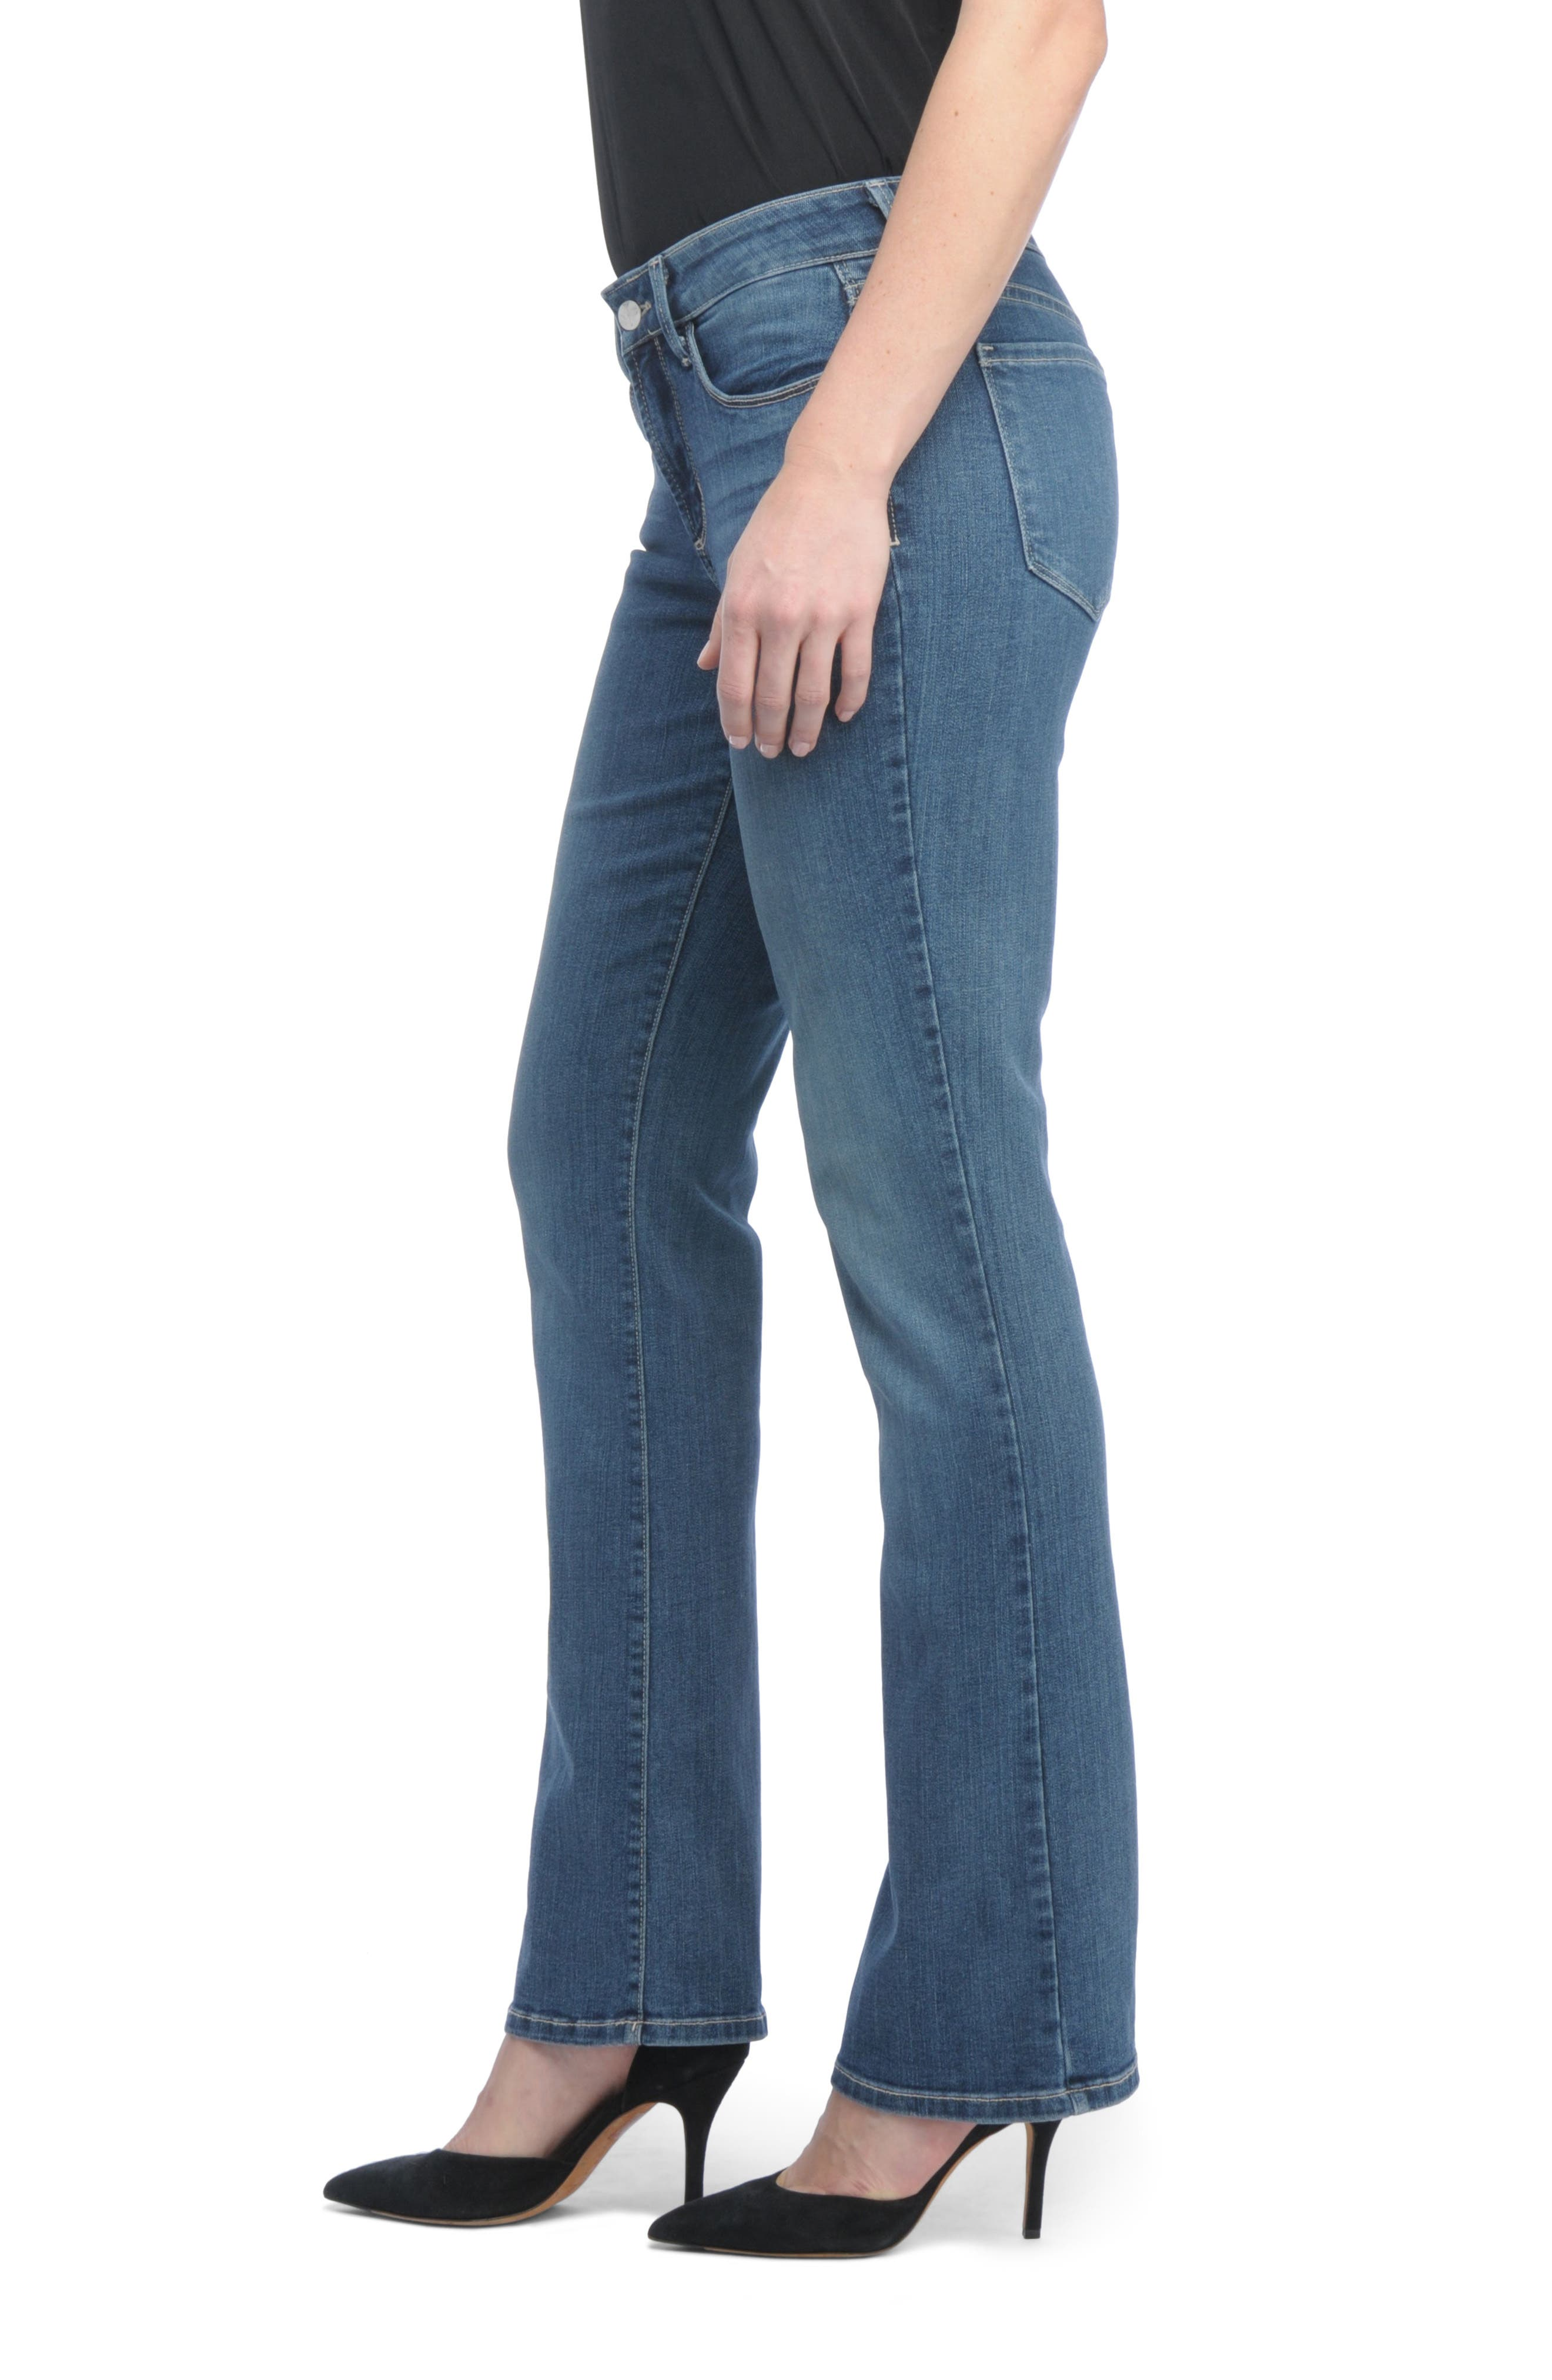 Barbara Bootcut Short Jeans,                             Alternate thumbnail 3, color,                             421